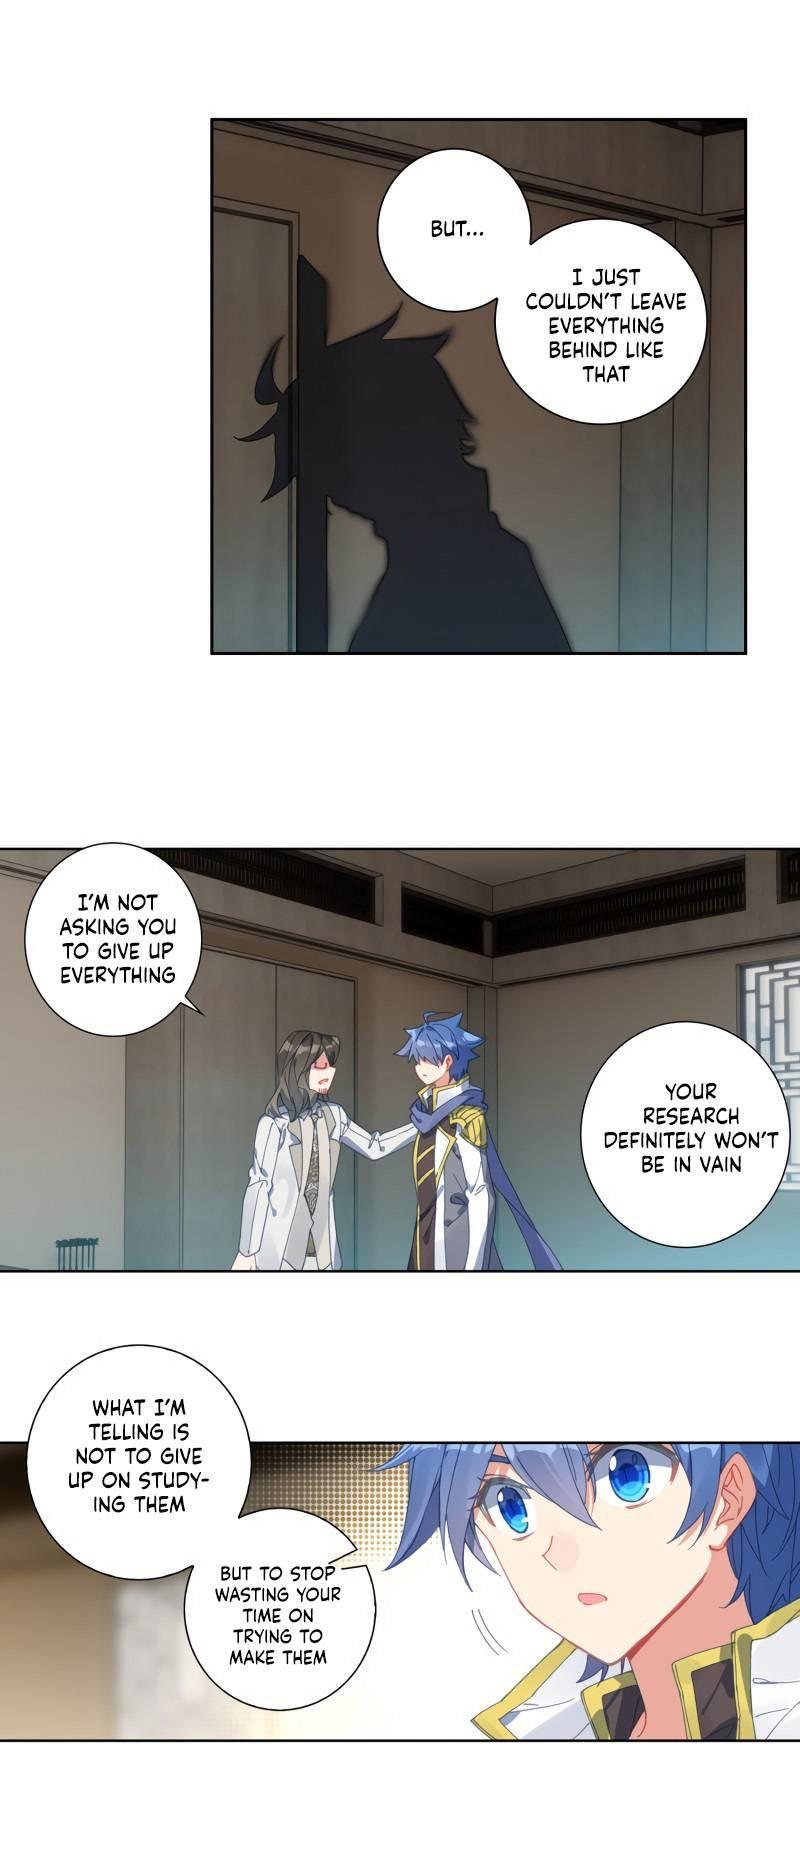 Douluo Dalu Ii - Jueshui Tangmen Chapter 265 page 10 - Mangakakalot